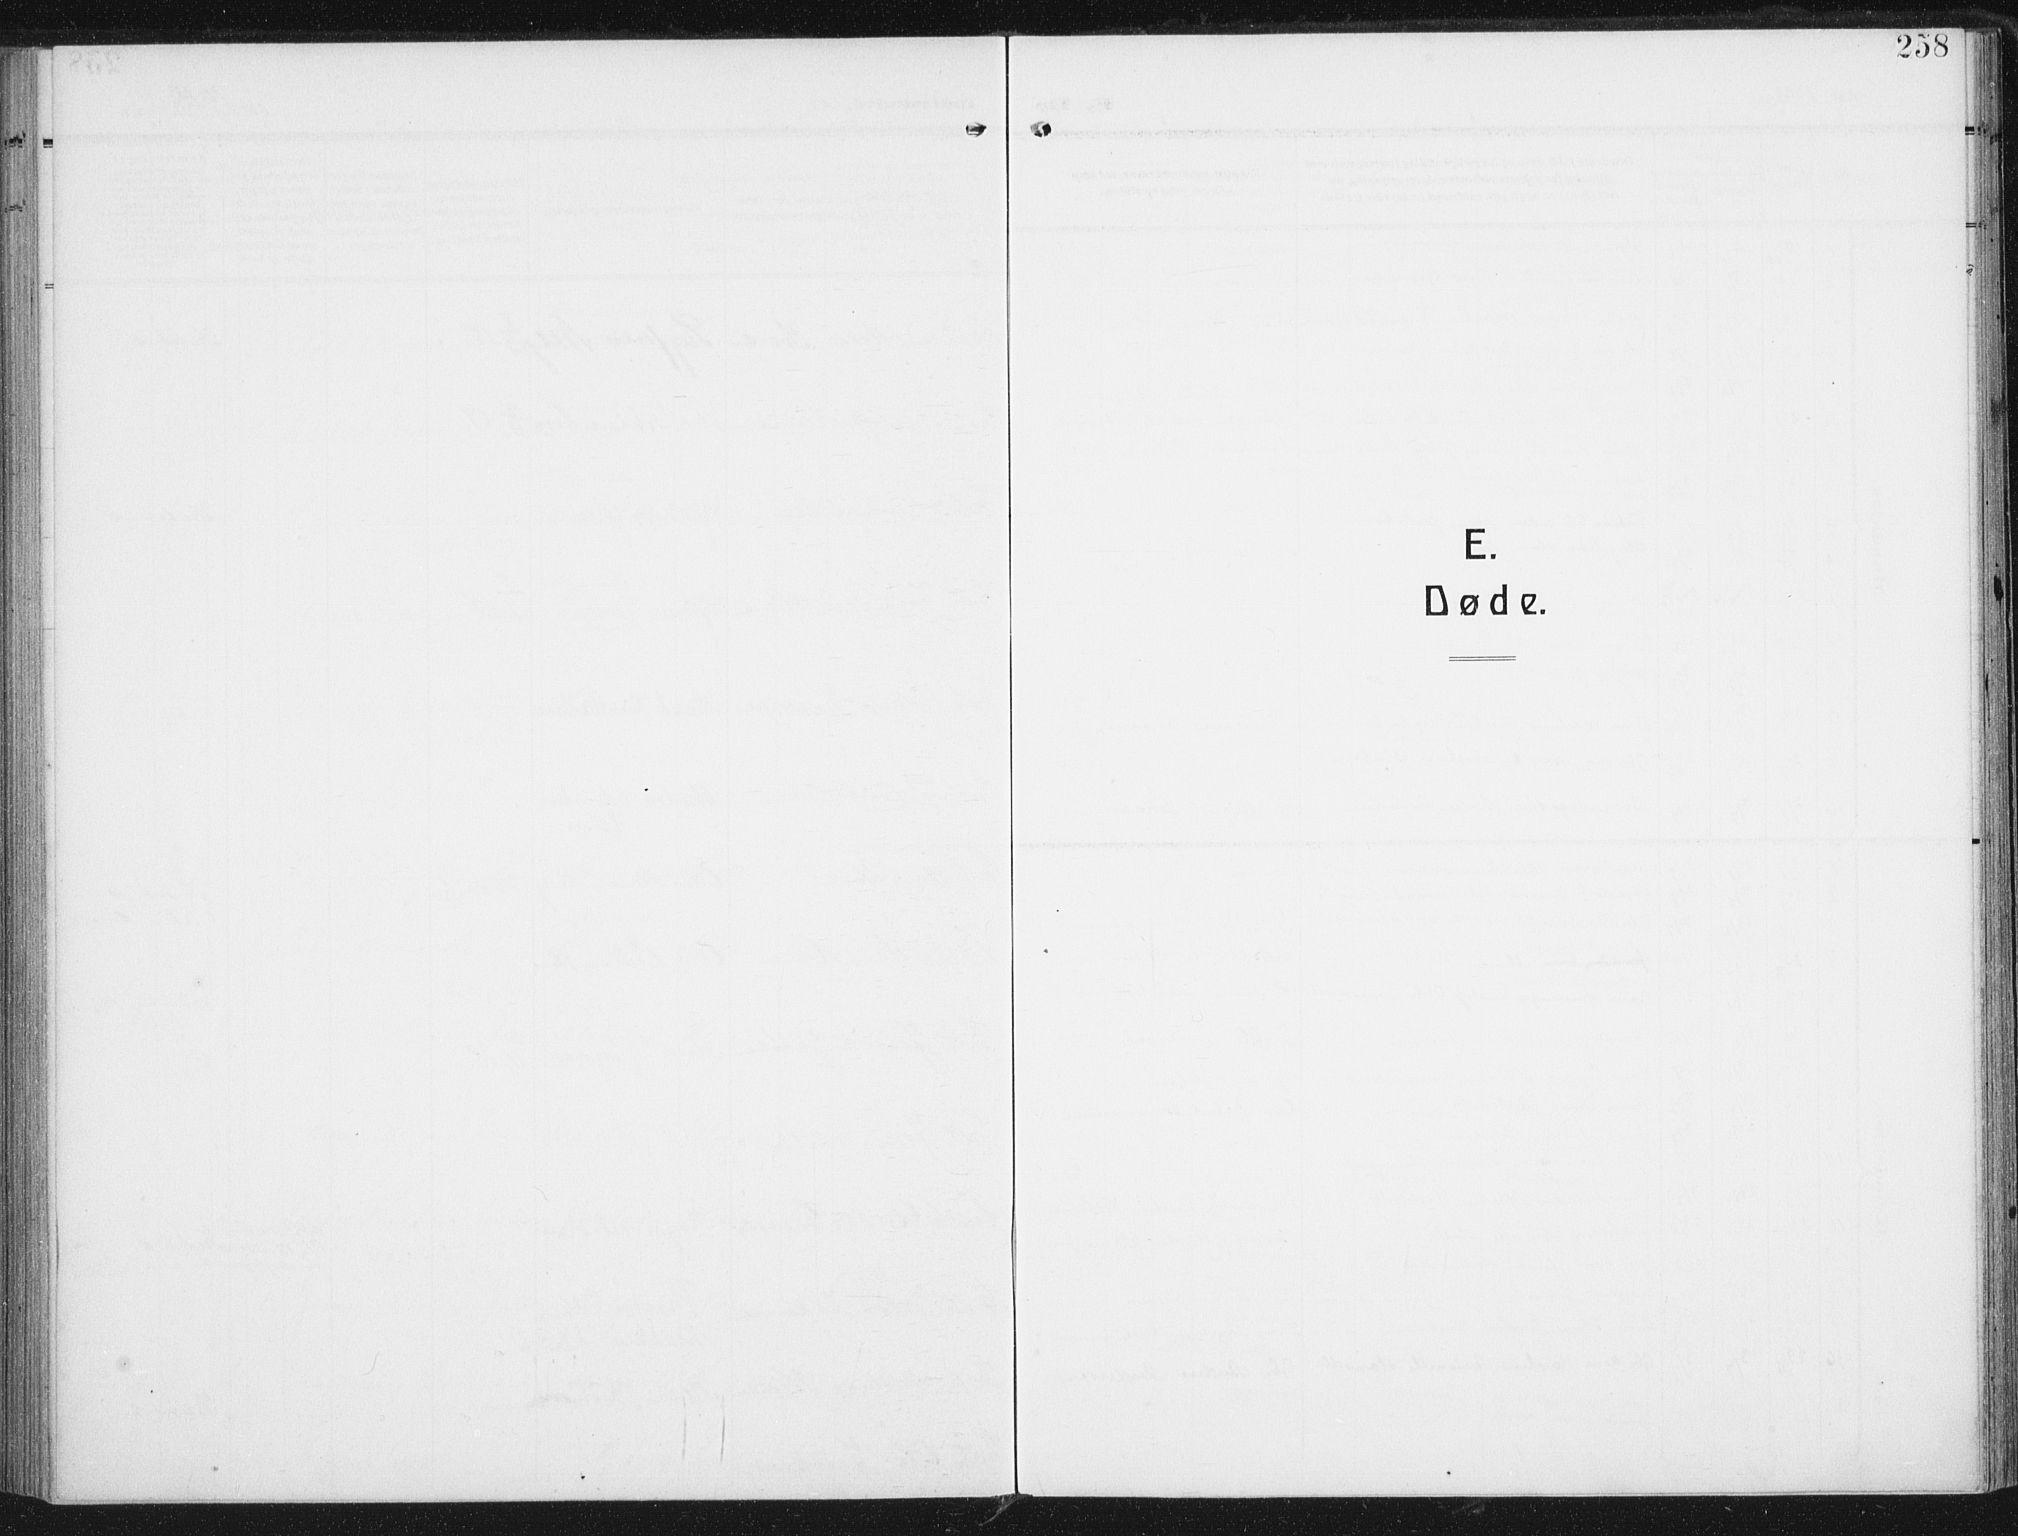 SAT, Ministerialprotokoller, klokkerbøker og fødselsregistre - Nordland, 880/L1135: Ministerialbok nr. 880A09, 1908-1919, s. 258